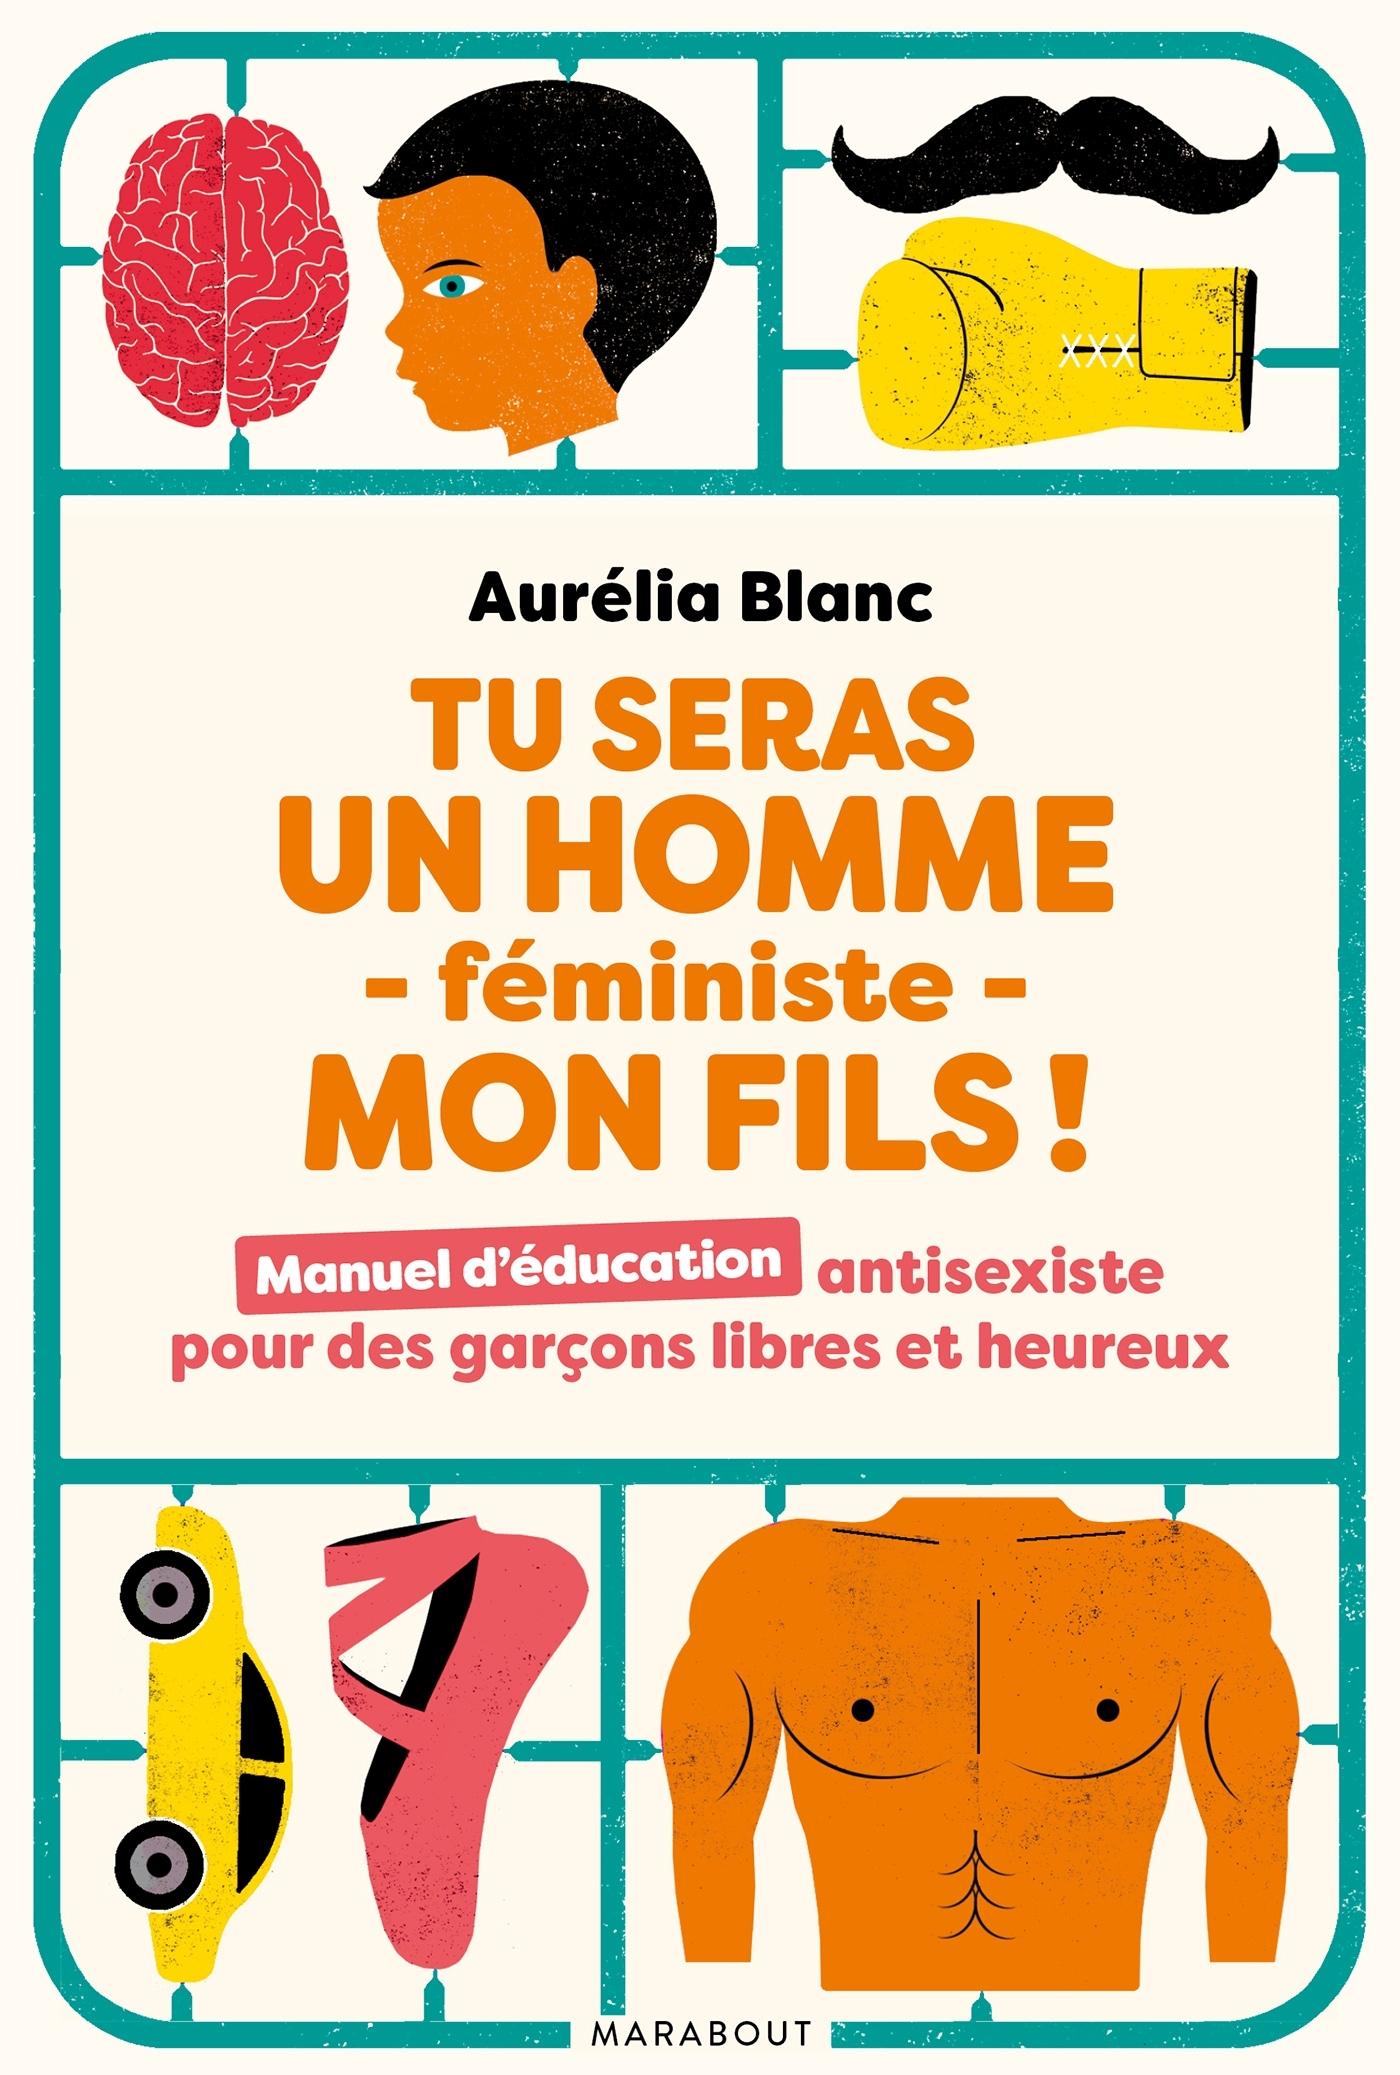 TU SERAS UN HOMME -FEMINISTE - MON FILS !